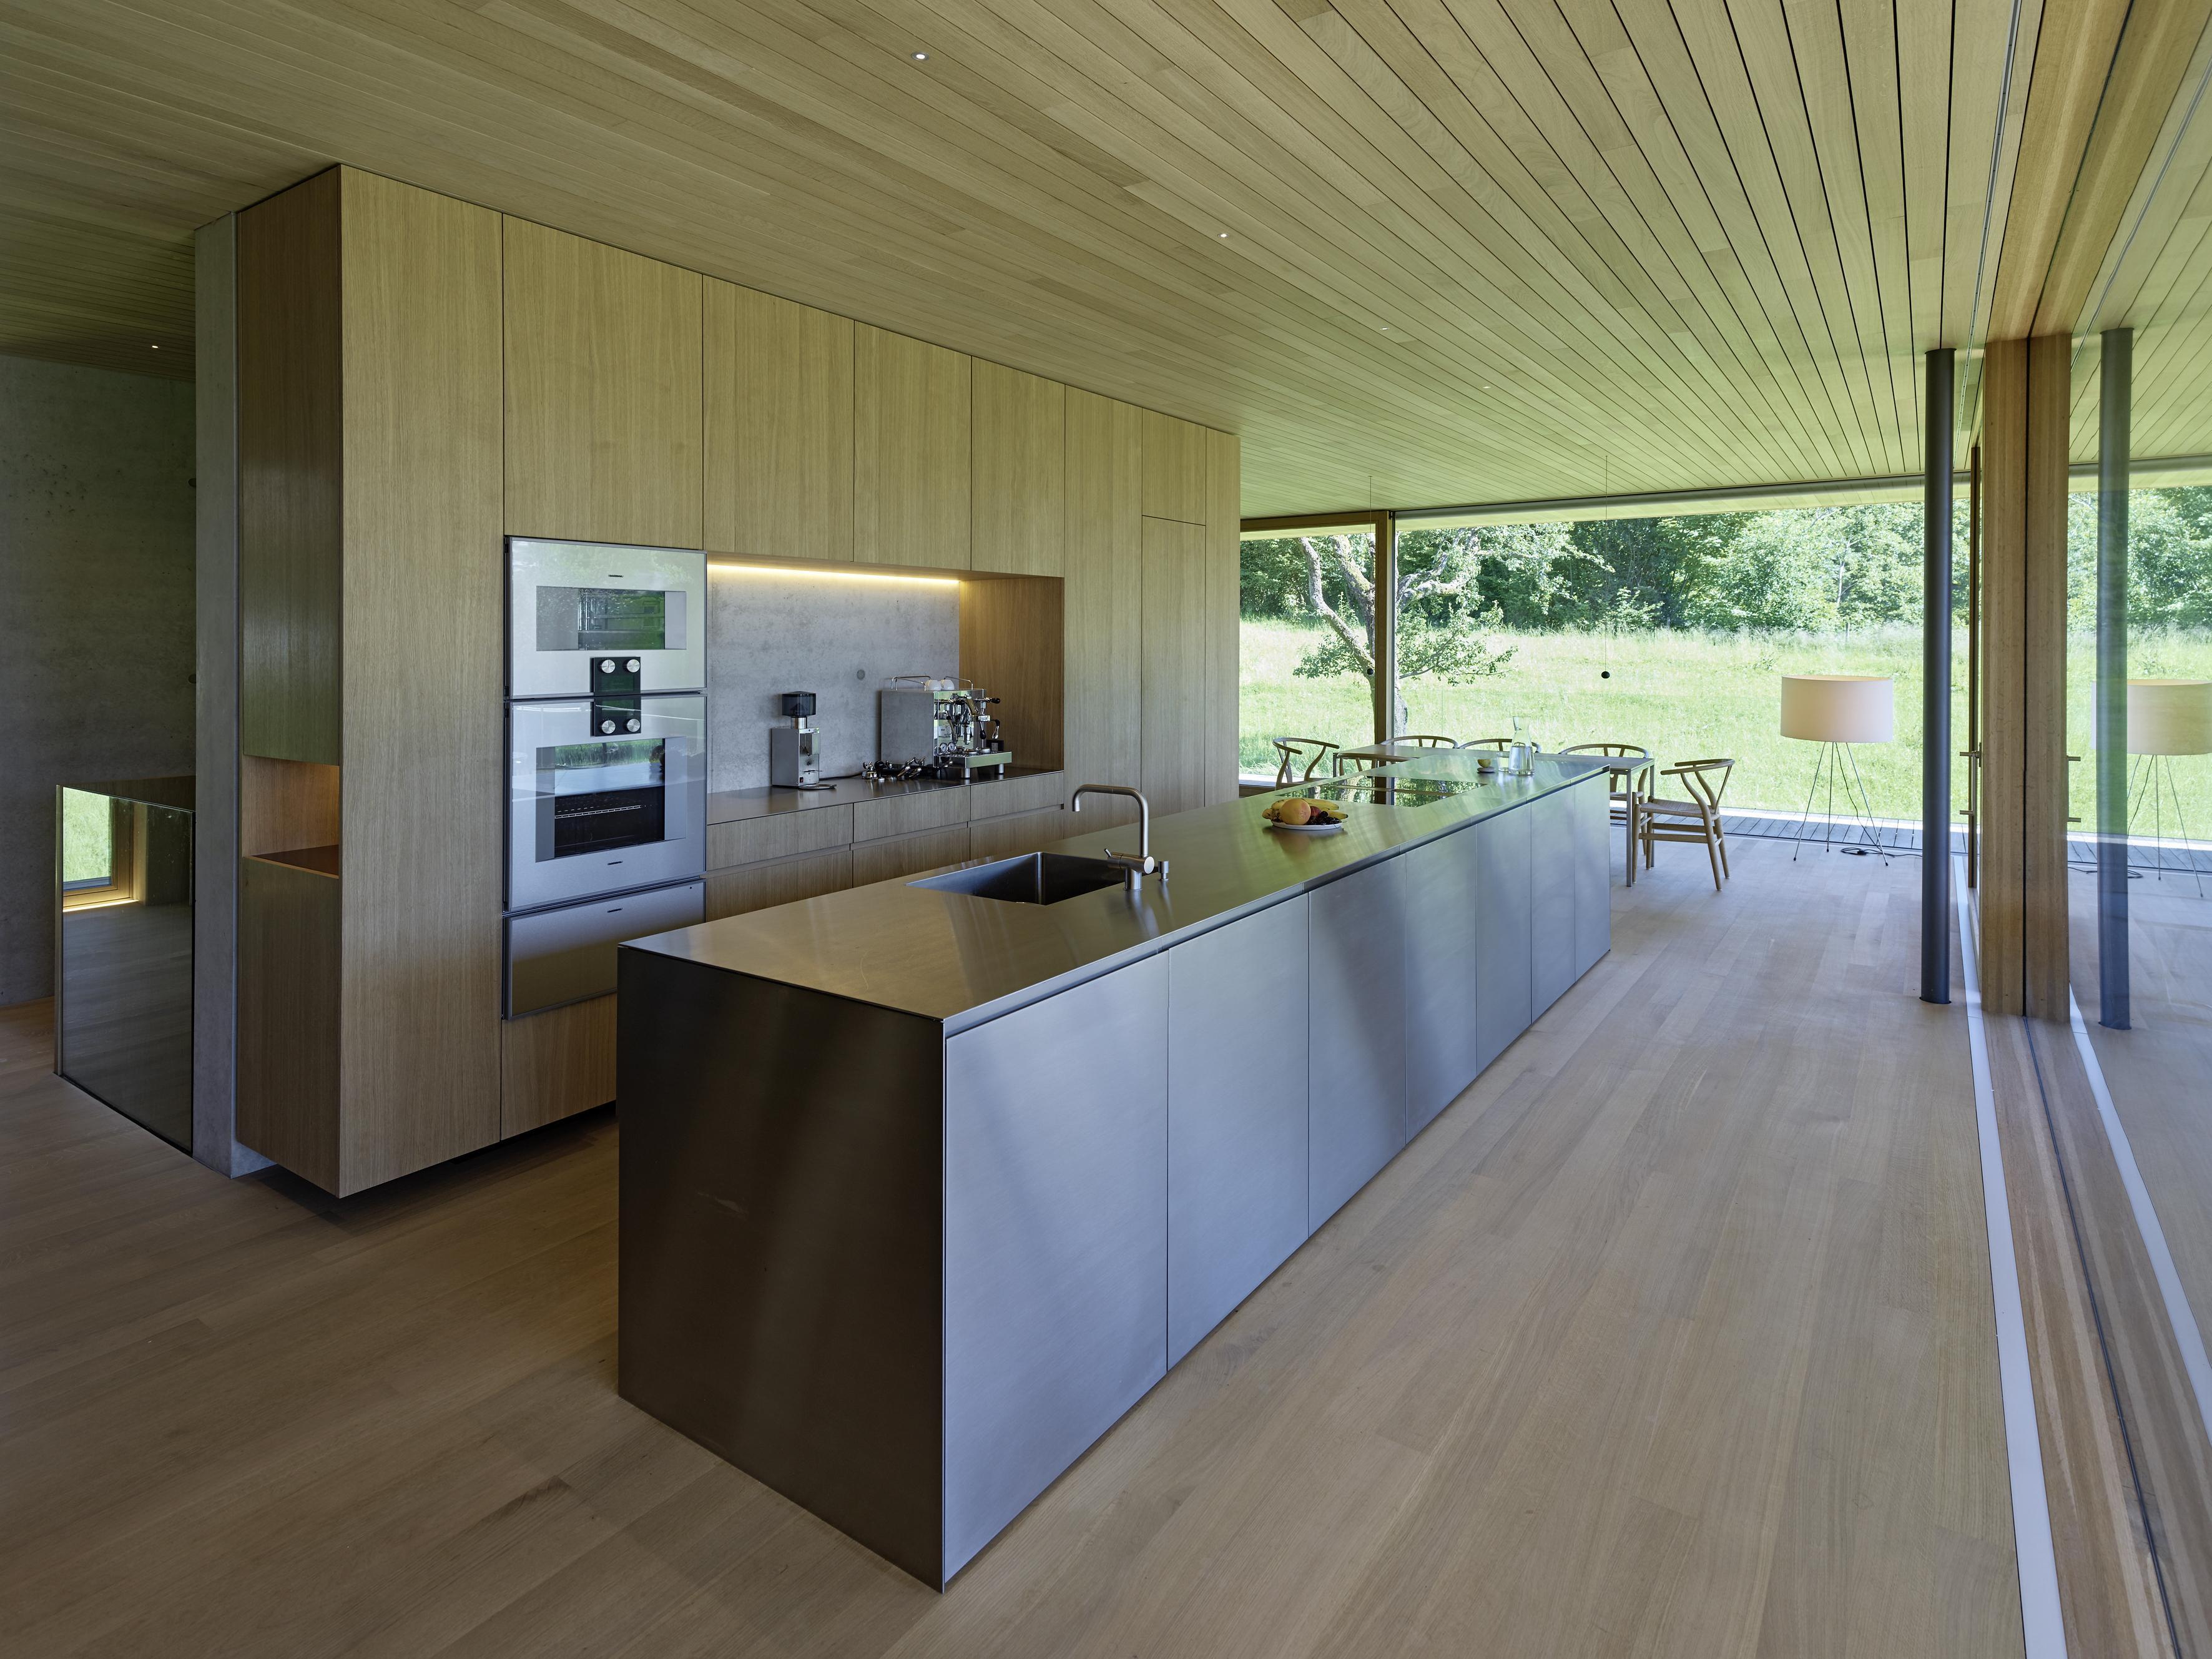 bora classic induktionskochfeld preis bora classic induktionskochfeld preis kochfeldabzug. Black Bedroom Furniture Sets. Home Design Ideas